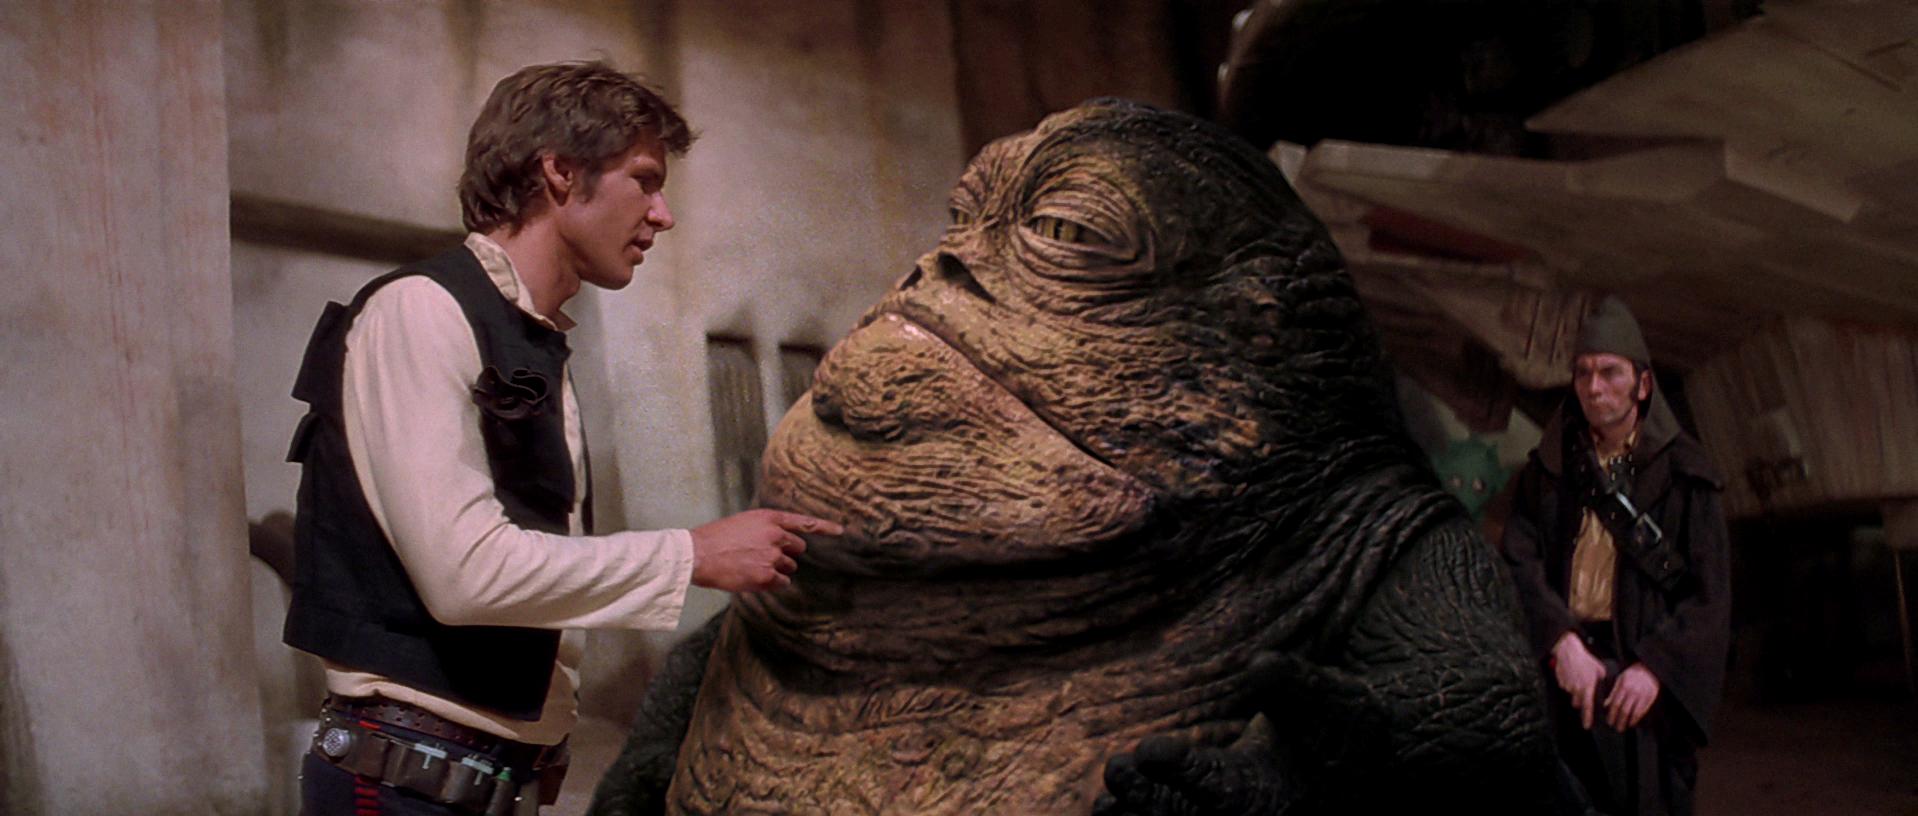 Jabba and Han